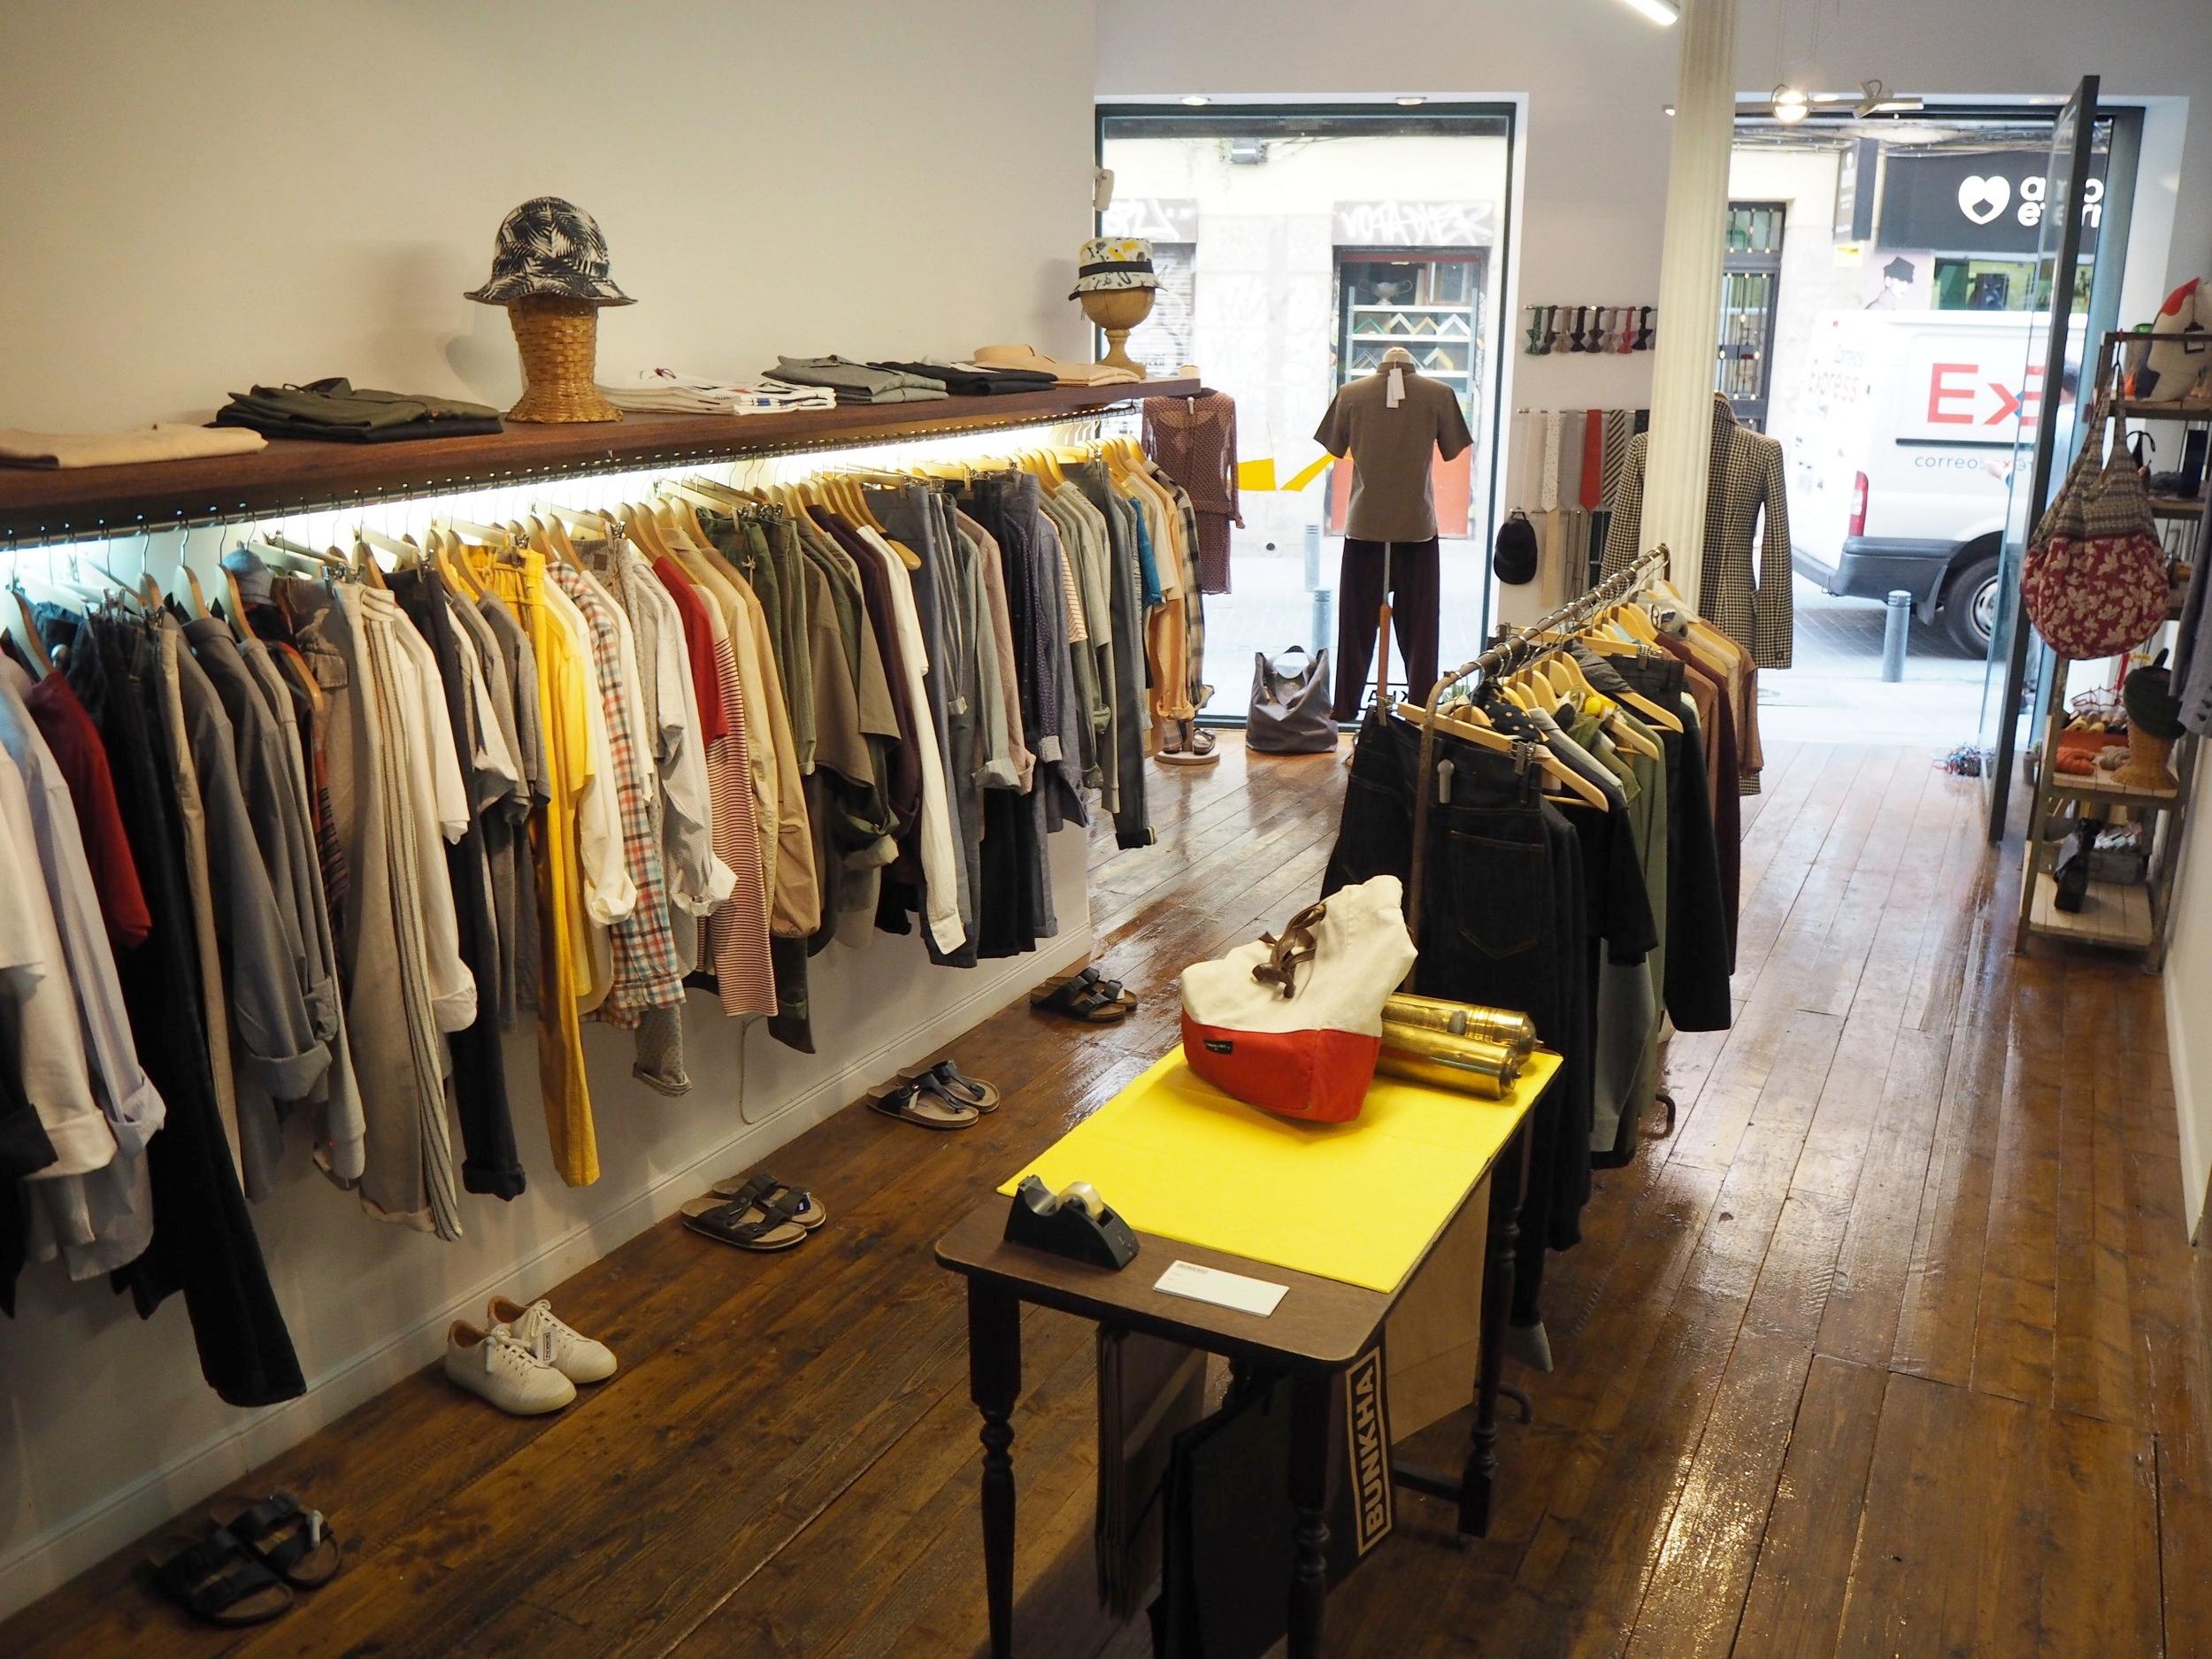 tiendas-ropa-madrid-originales-bunkha-moda.JPG